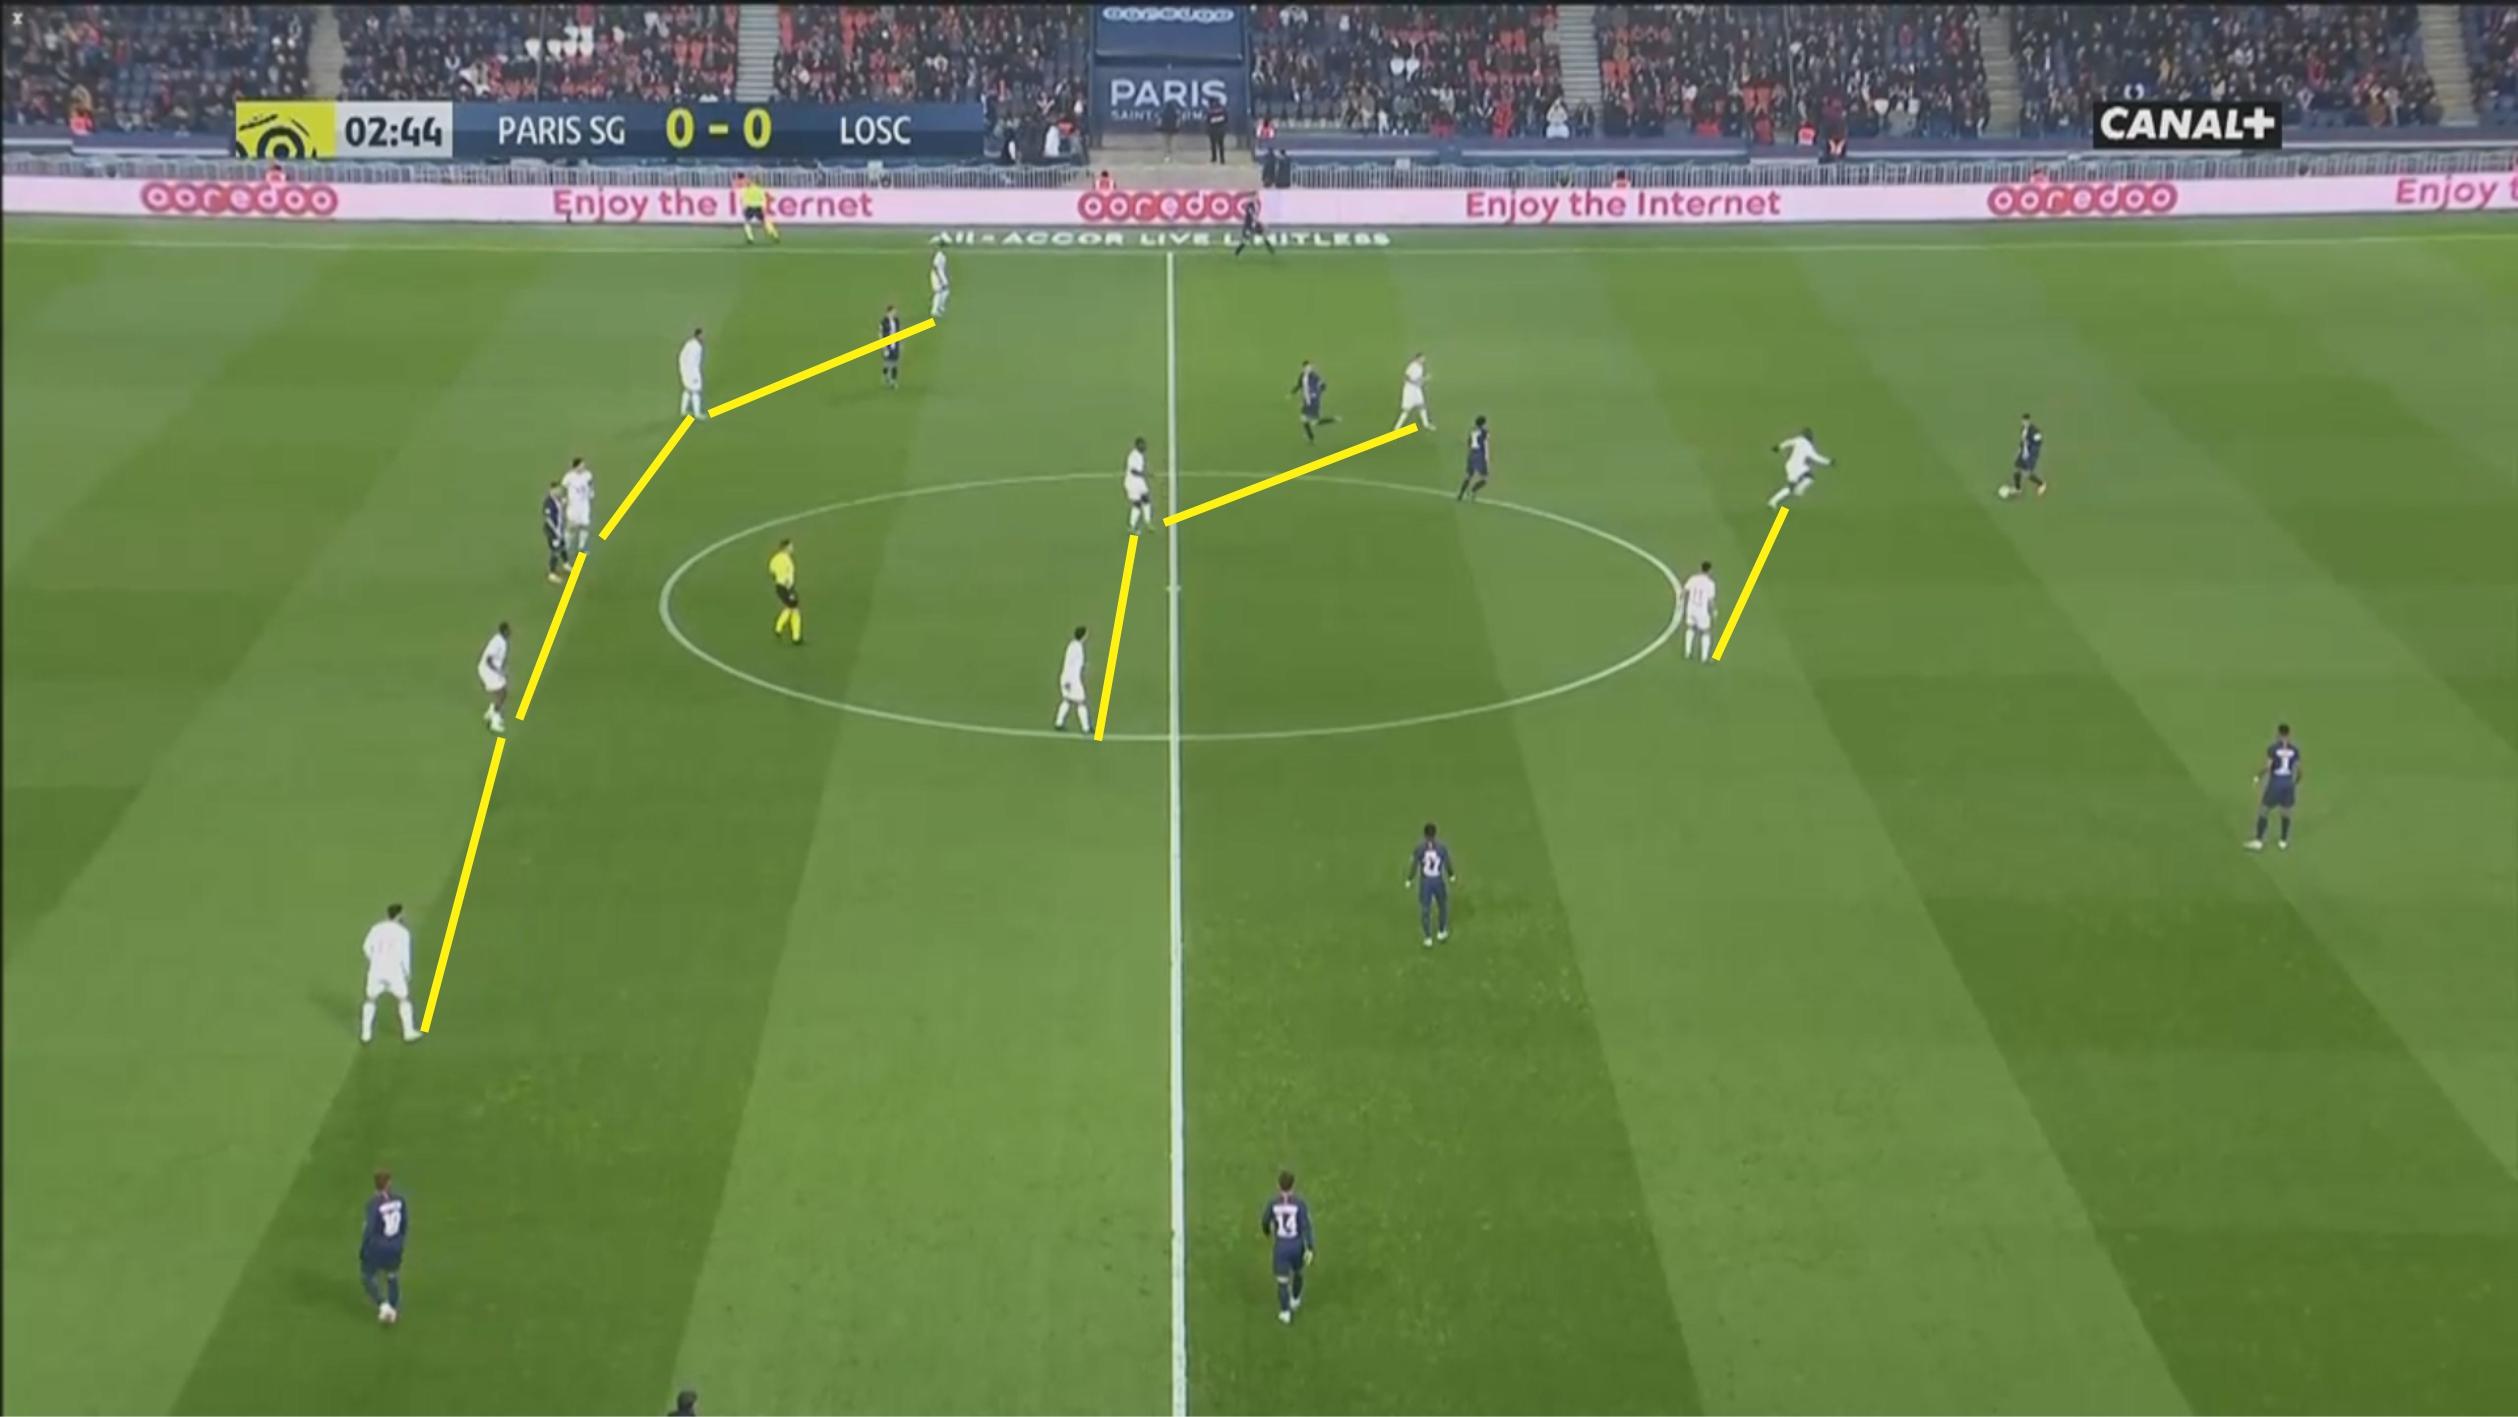 Ligue 1 2019/20: Paris Saint-Germain vs Lille- tactical analysis tactics